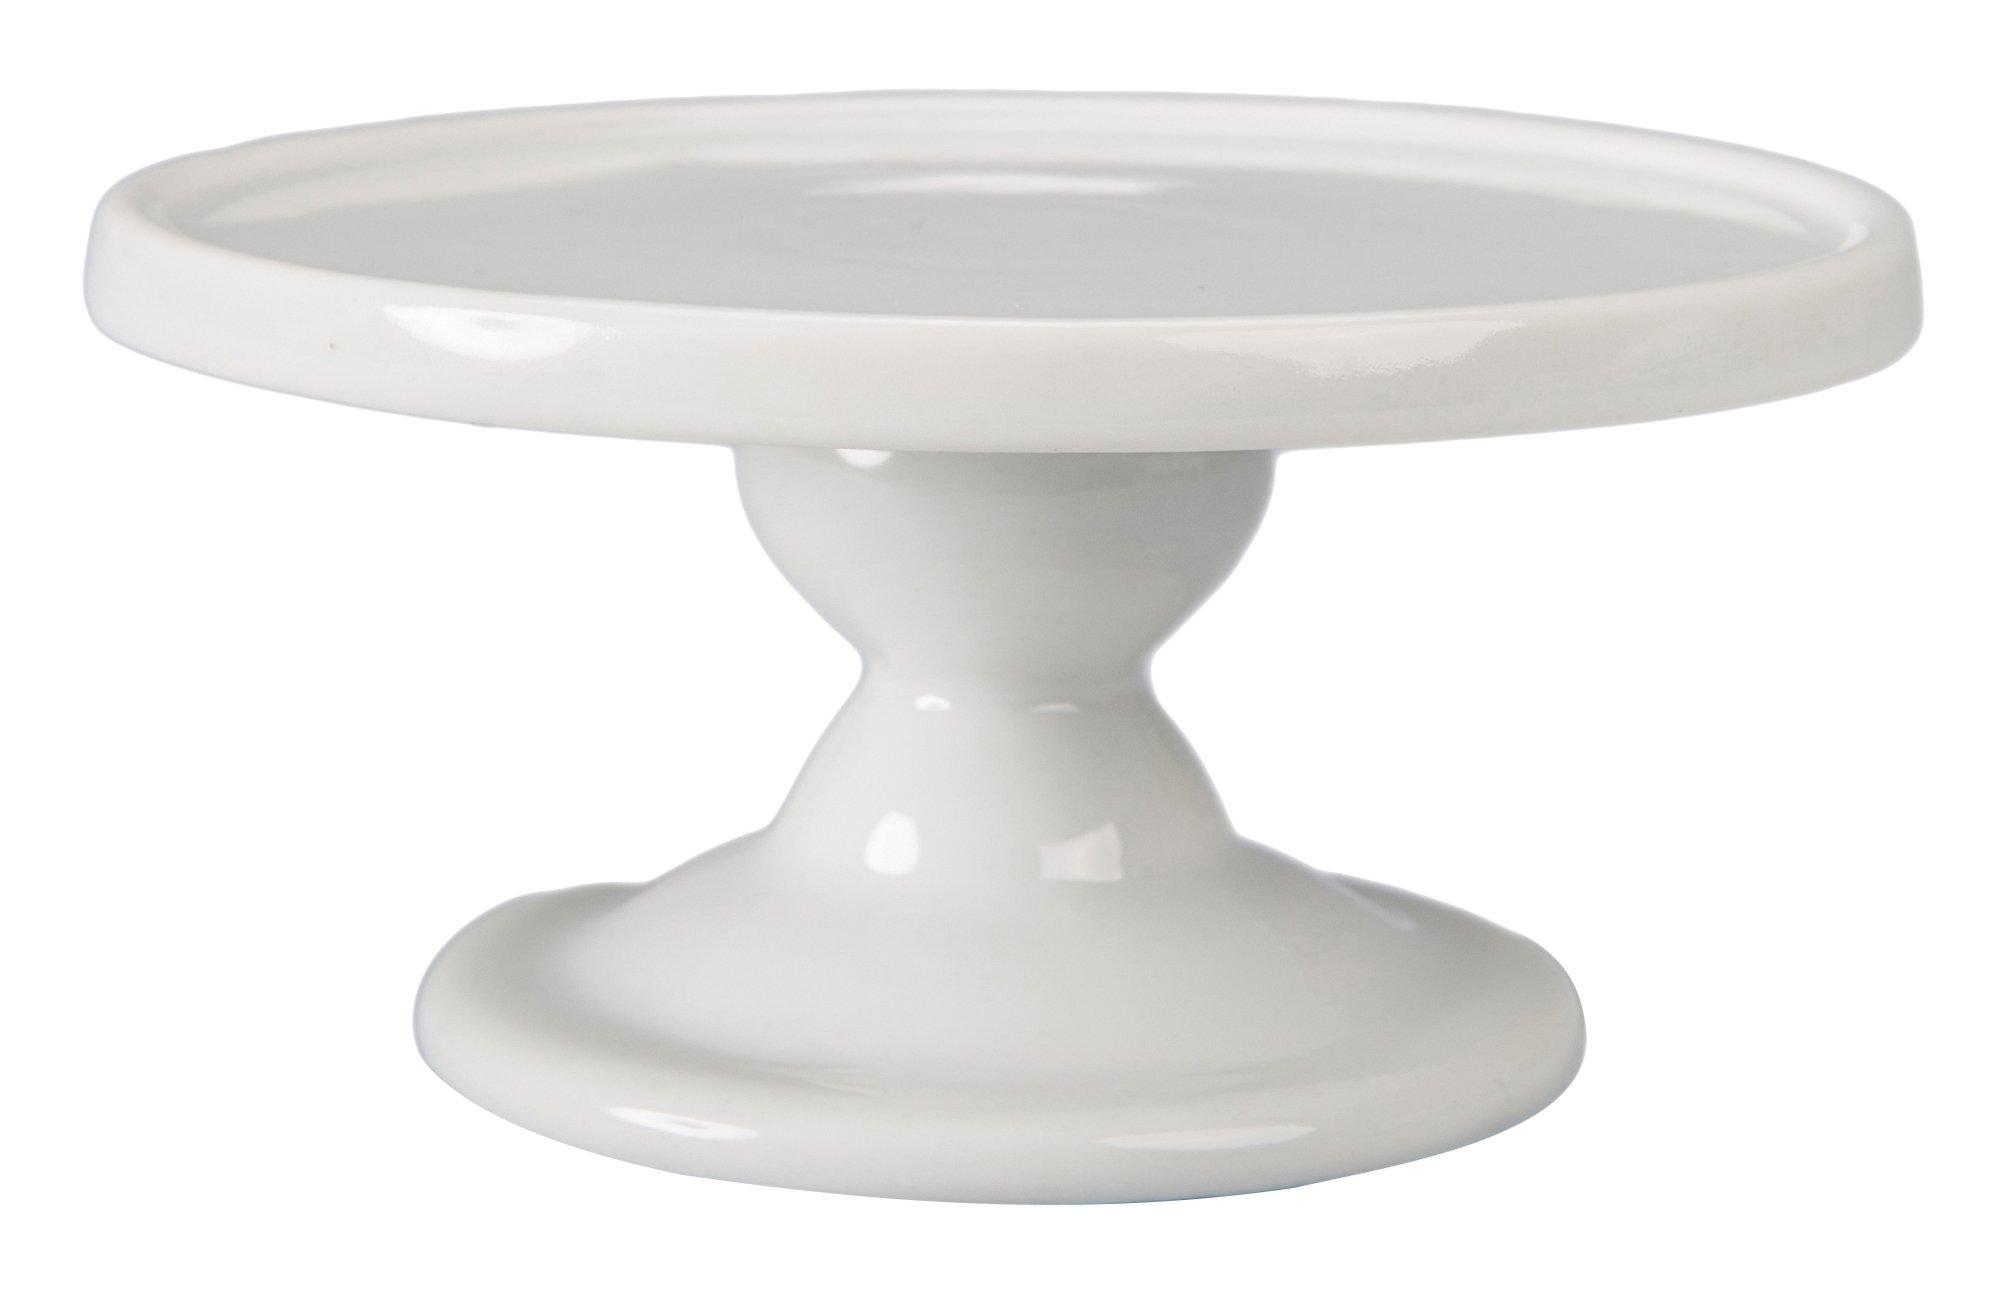 BIA Cordon Bleu Mini Cupcake Stand, Set of 4, White